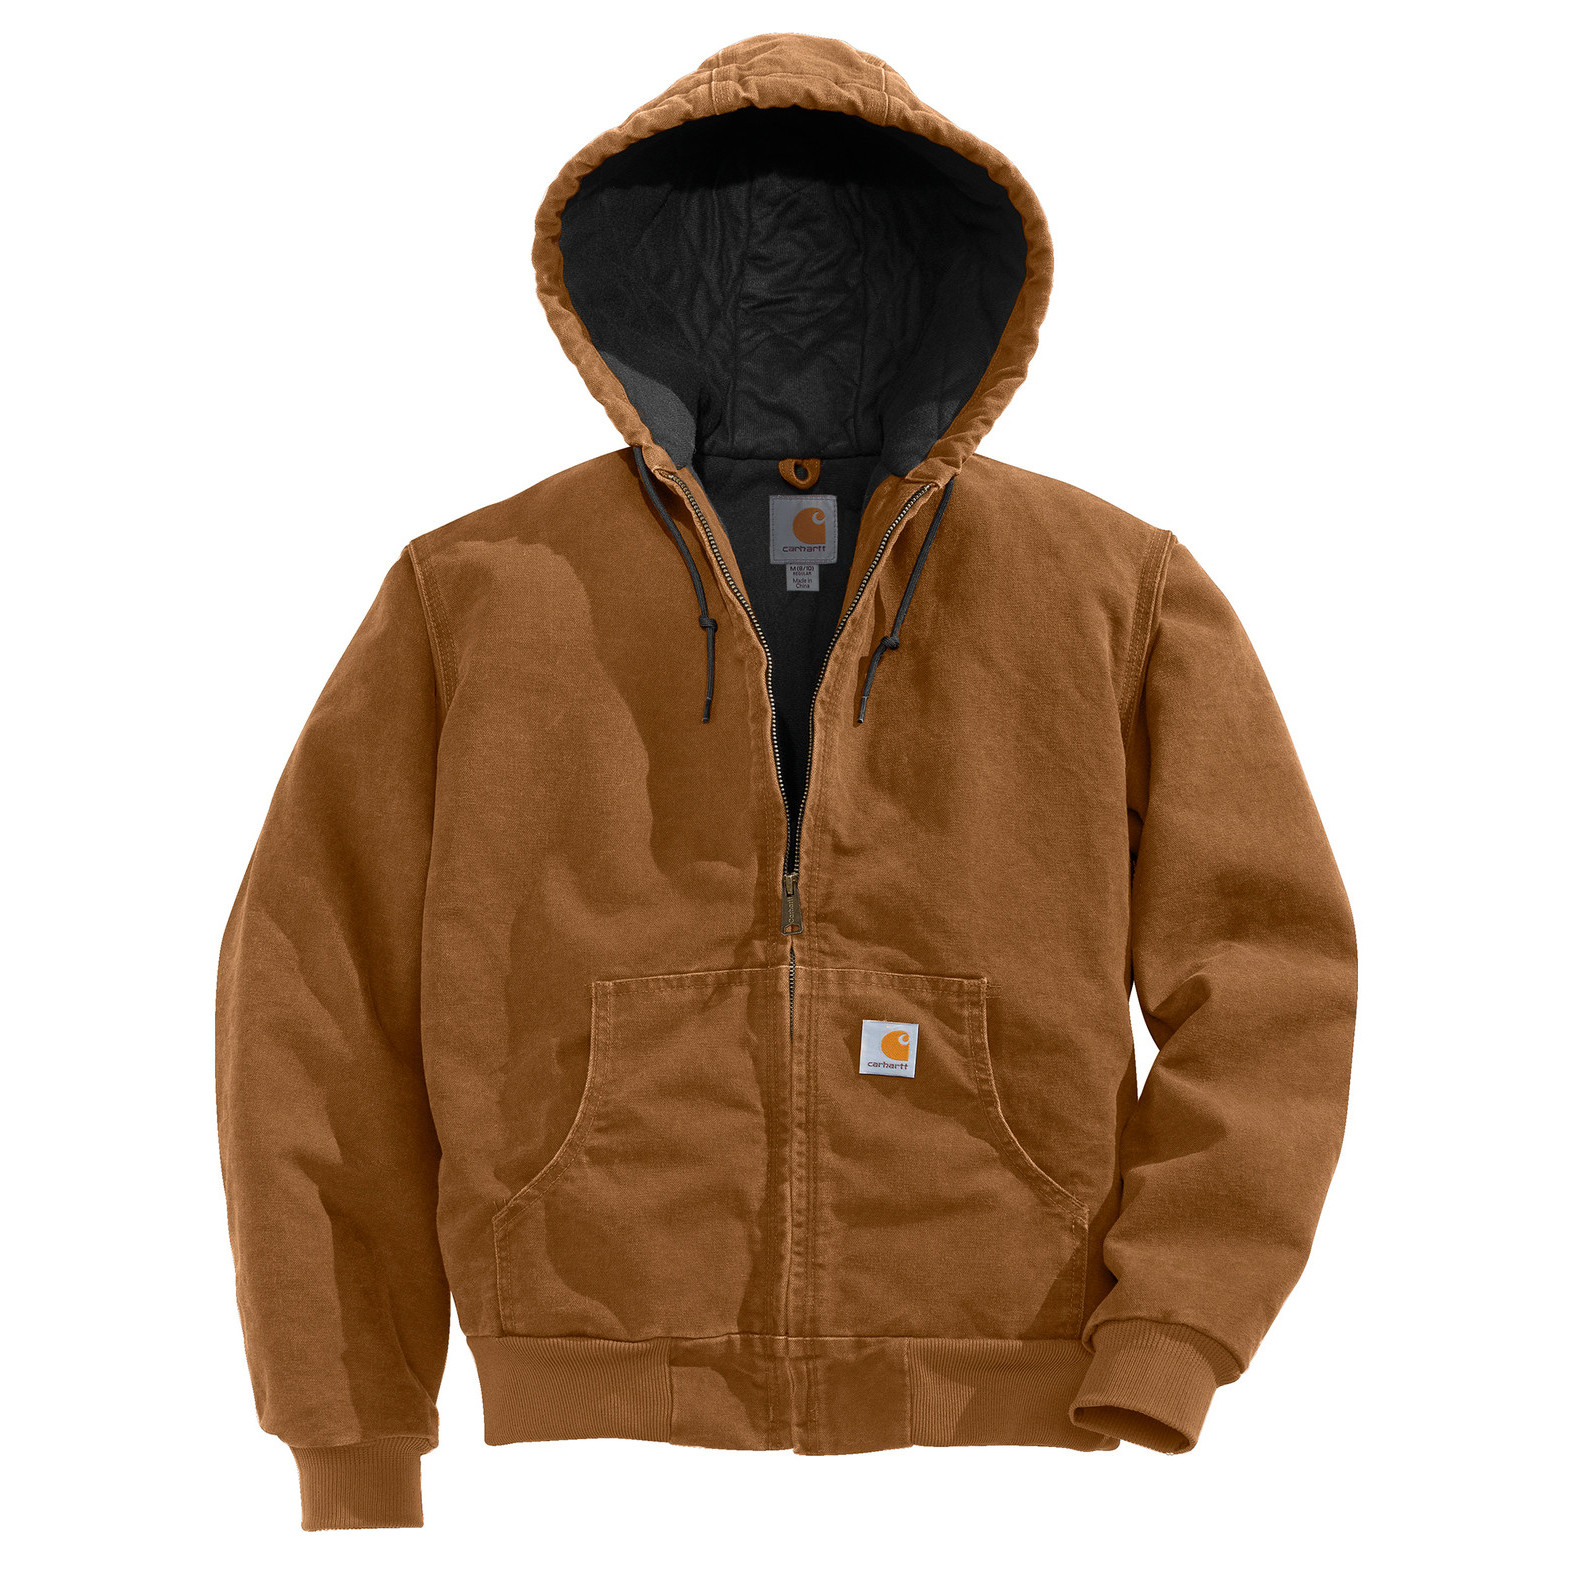 Куртка-кенгуру Carhartt Sandstone Active Jacket - J130 (Carhartt Brown, S)